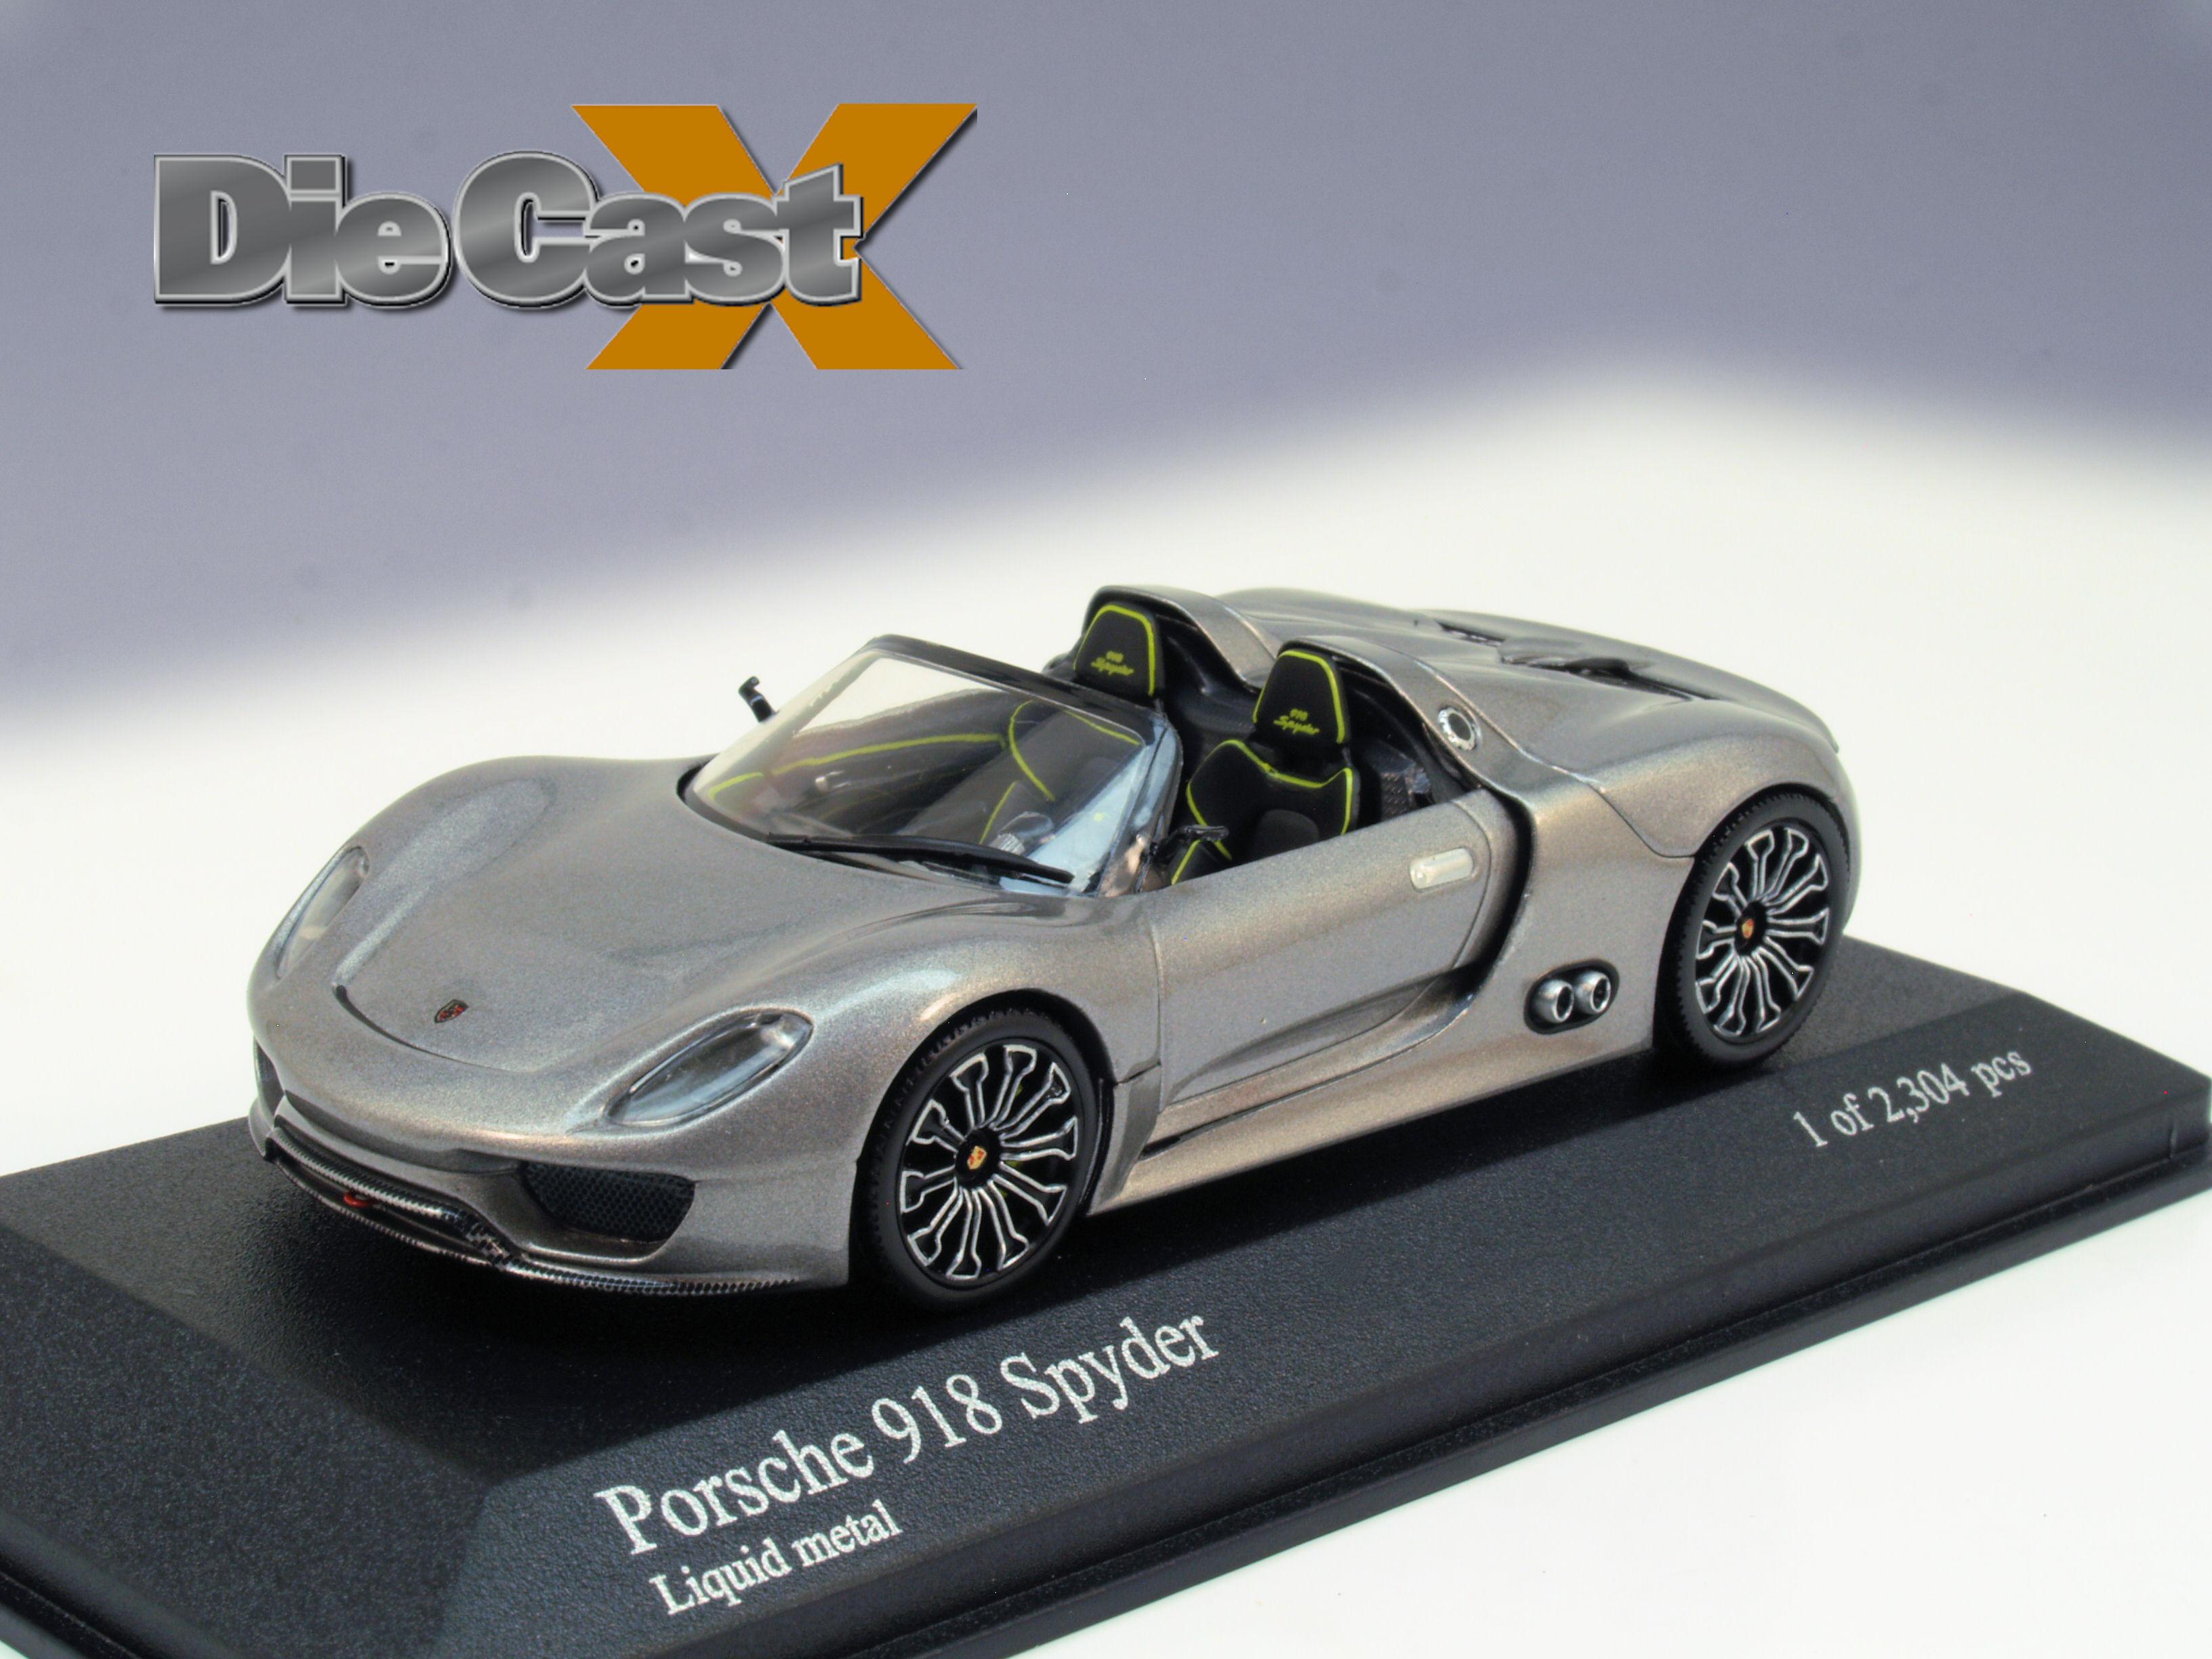 Minichamps 1:43 Porsche 918 Spyder: Electric Slide